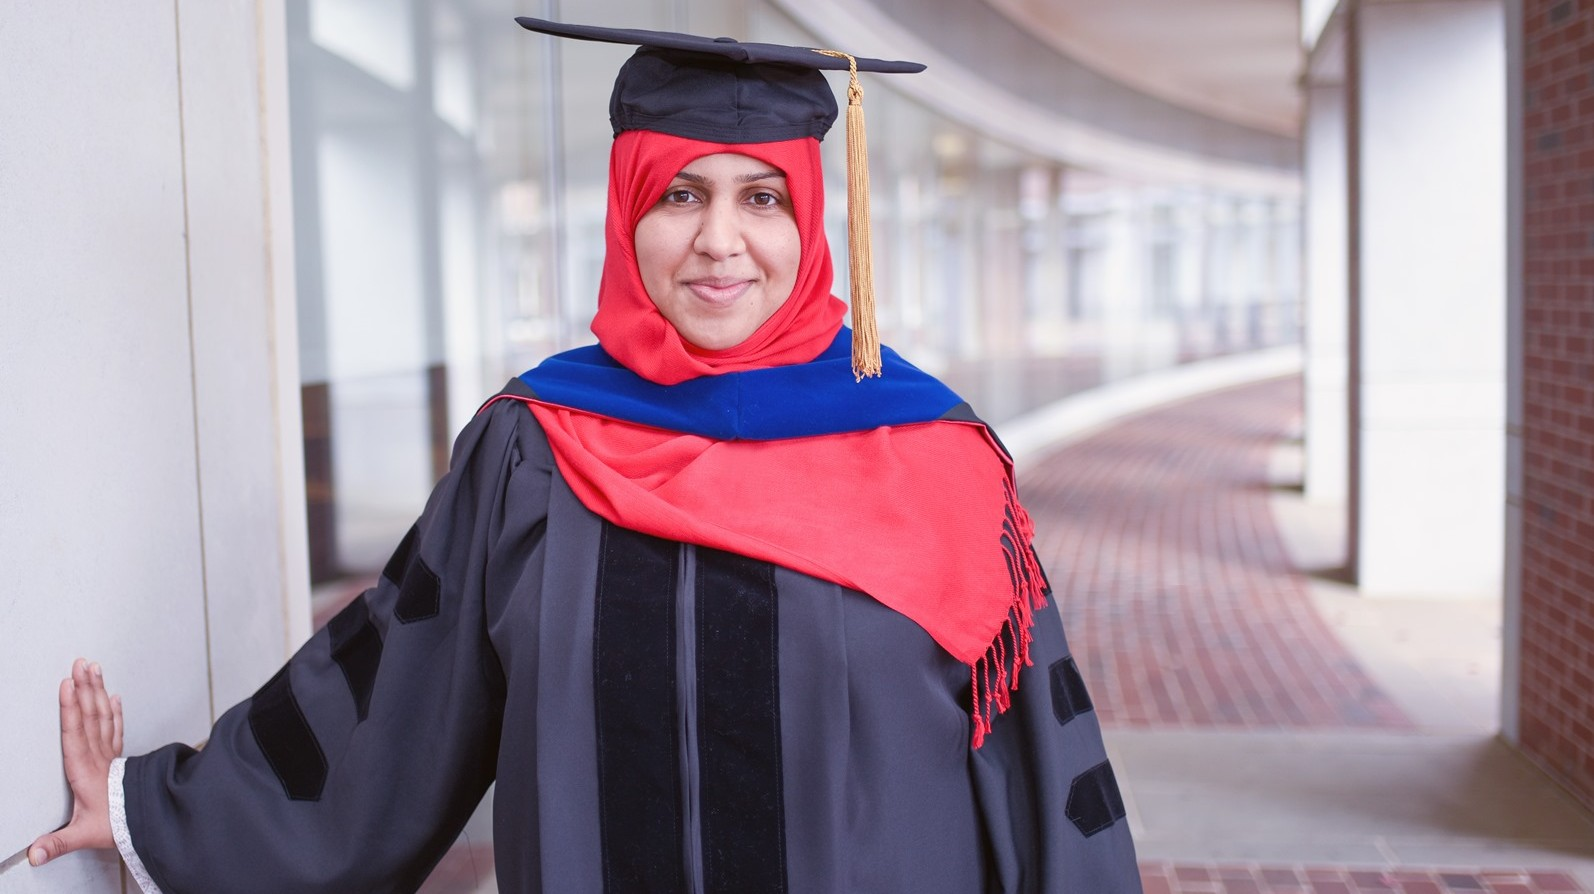 Al-Mohsin in commencement robe